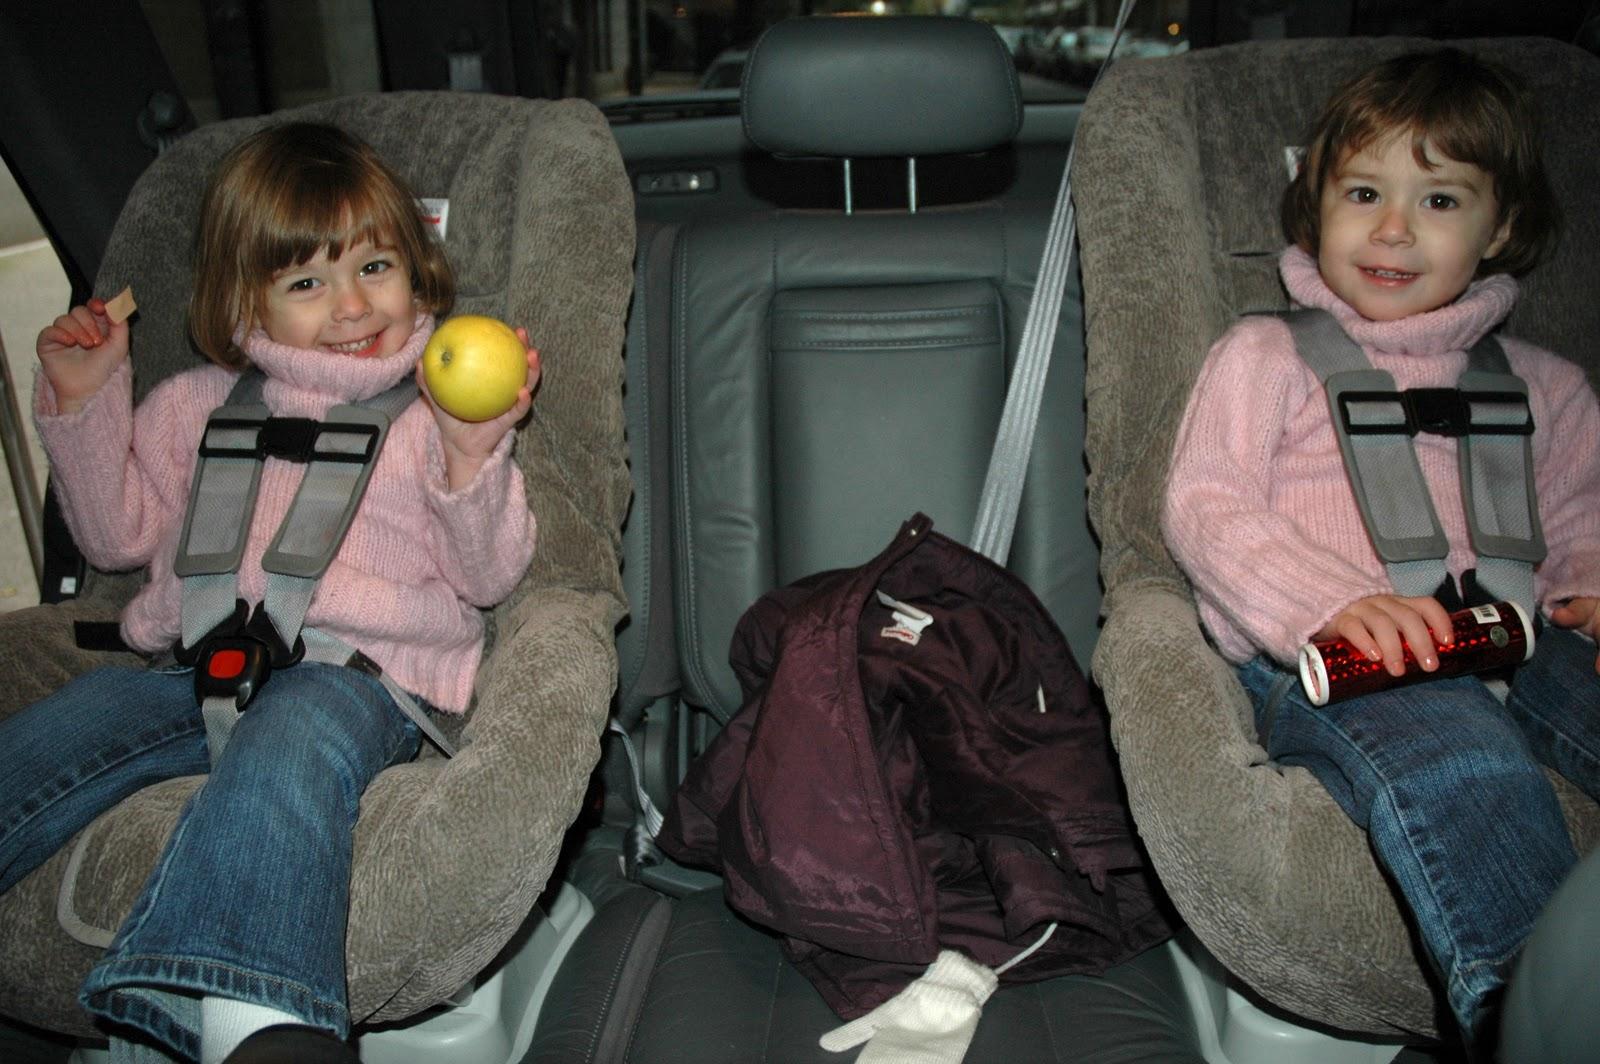 http://3.bp.blogspot.com/_lD3yww-V03I/TSZTeQ6hE-I/AAAAAAAAEnY/IfIF0WfU_n0/s1600/Twin+girls+with+coats+off+and+straps+snug.jpg